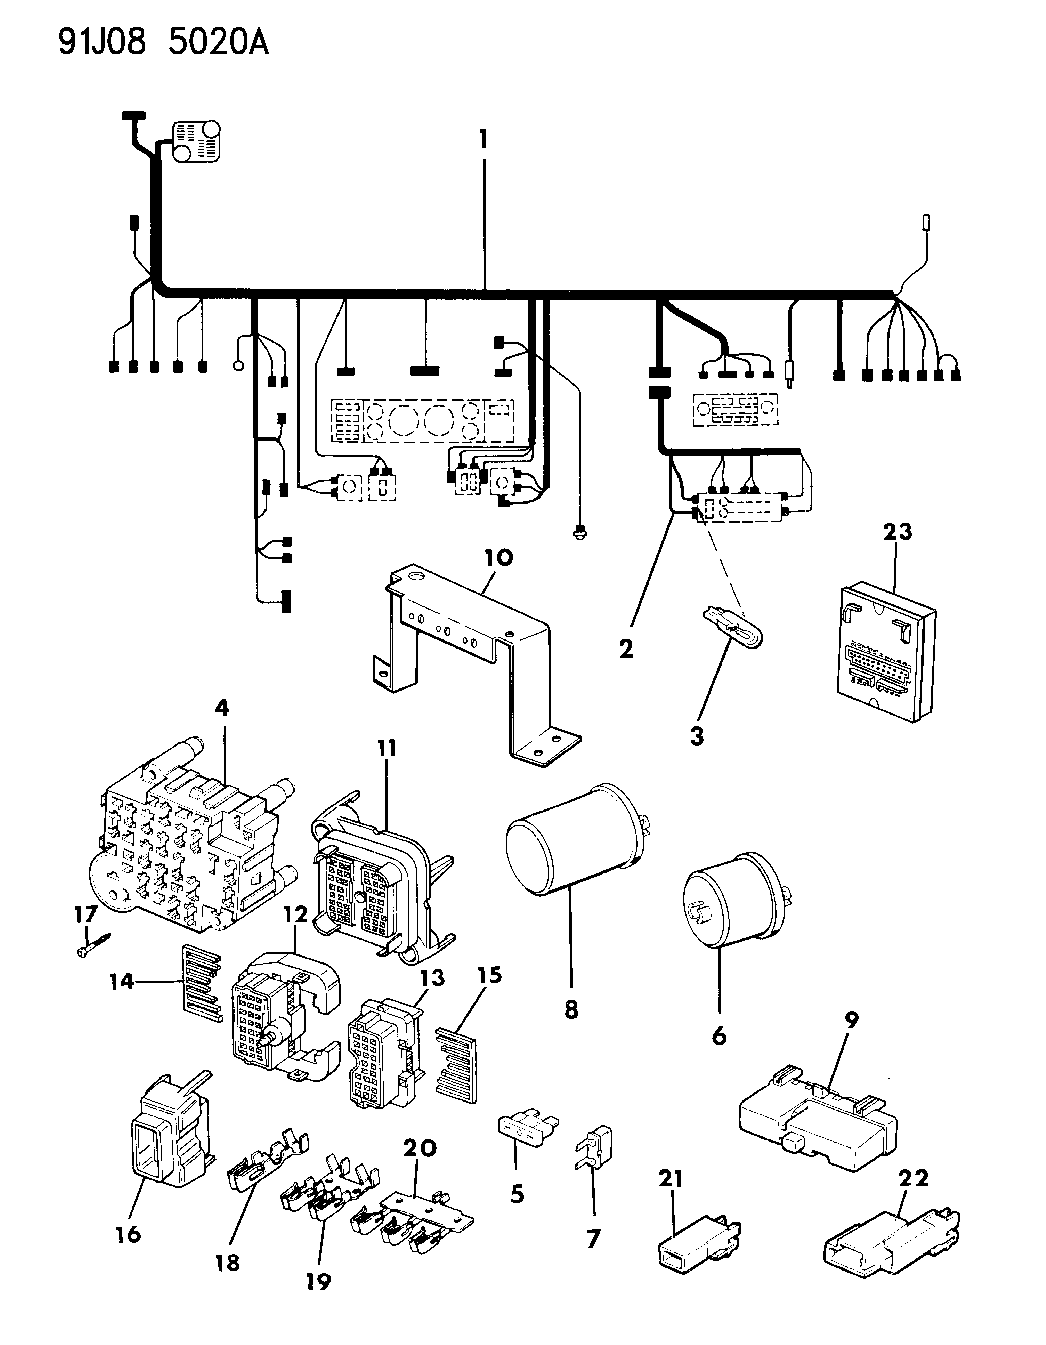 1992 jeep cherokee wiring - instrument panel - mopar parts ... 1992 cherokee fan wiring diagram #15